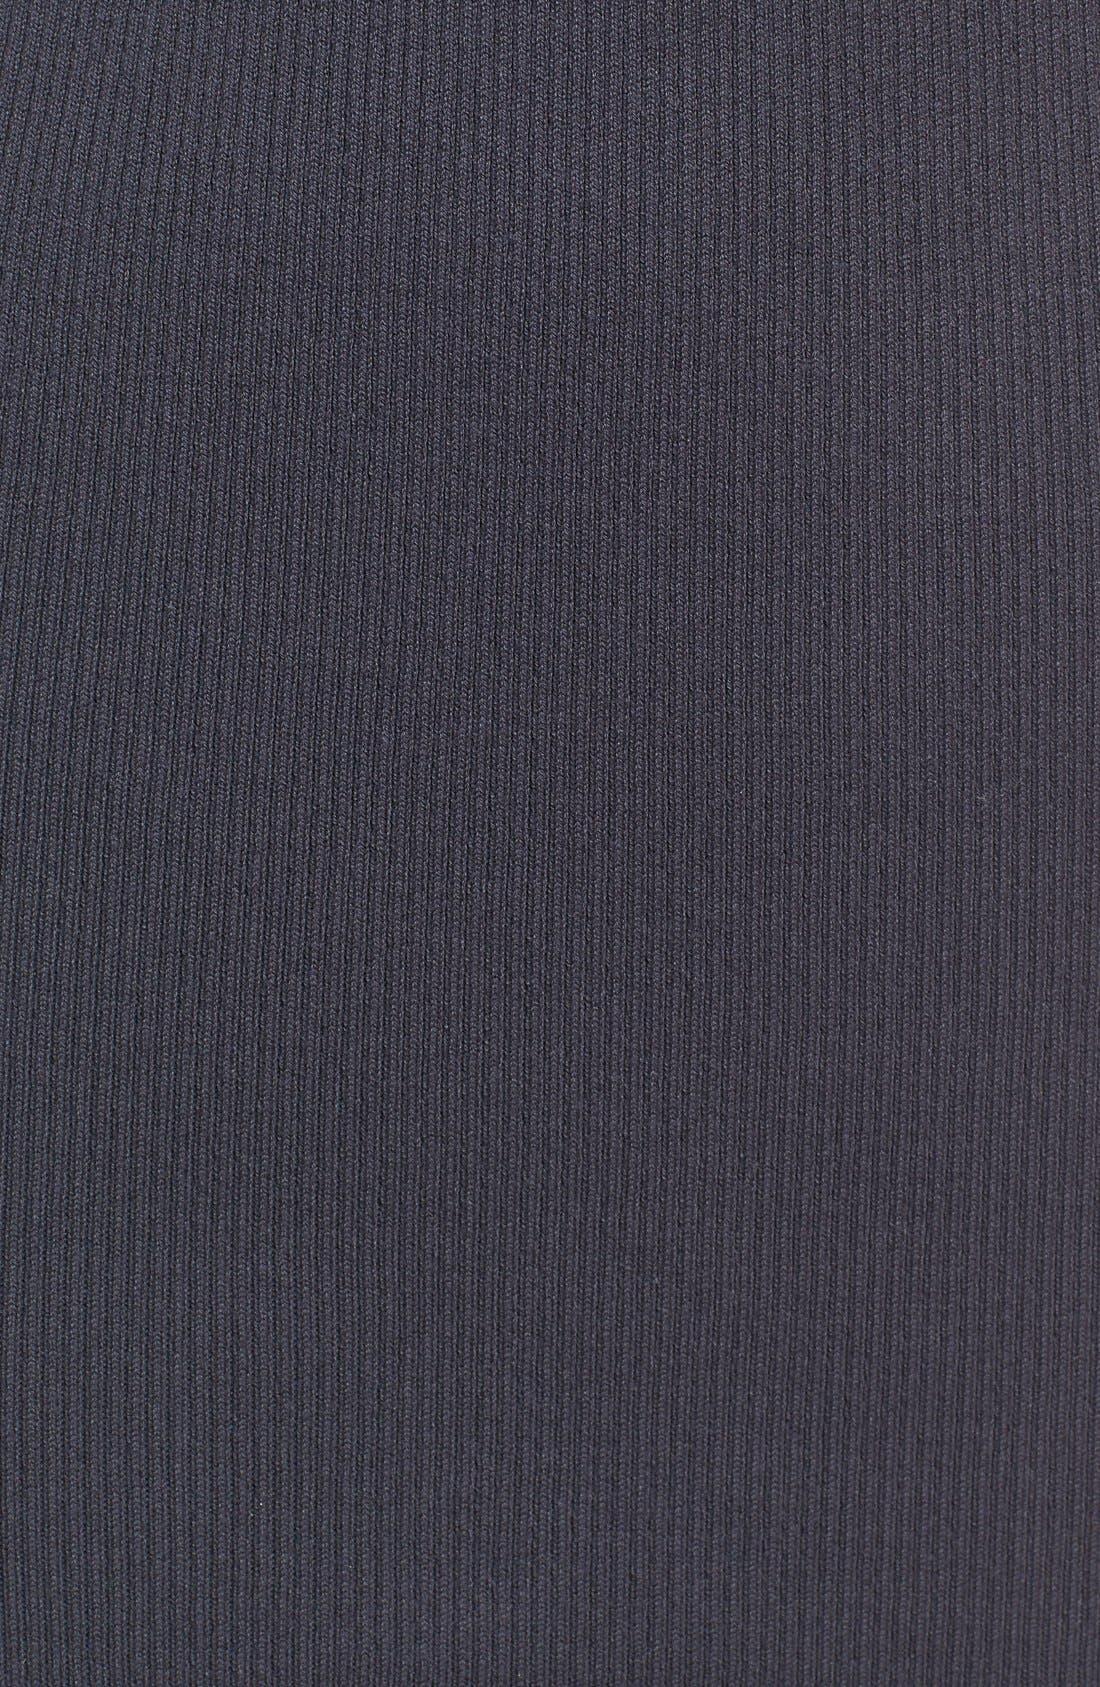 Alternate Image 5  - BP. Cutout Sweater Dress